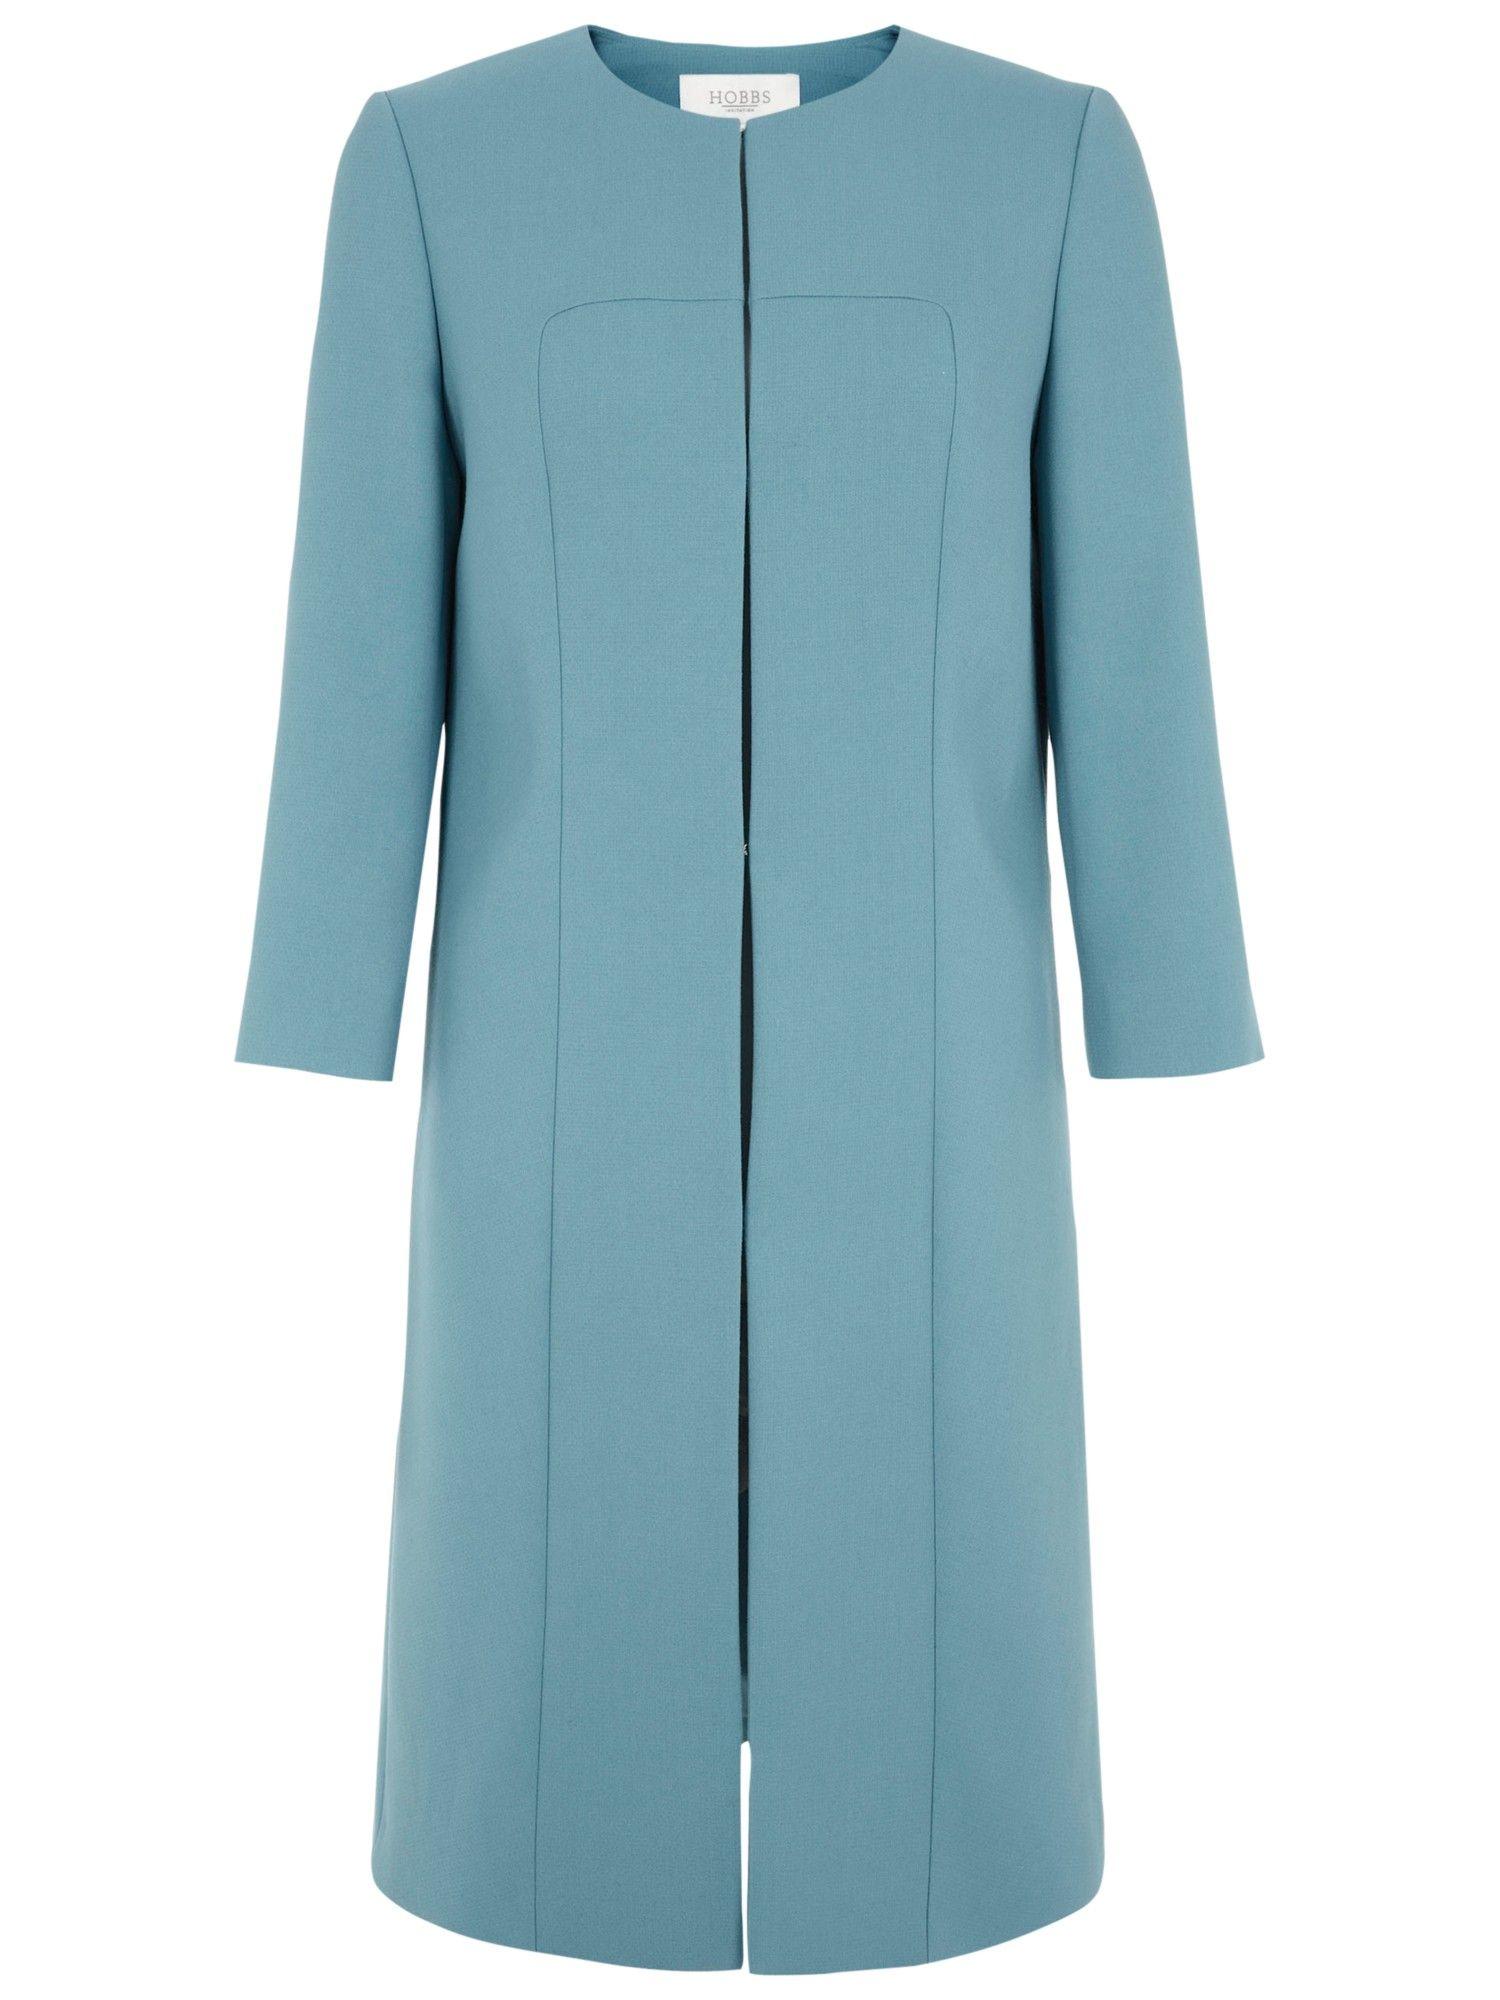 Wedding Occasion Coats Faux Fur Capes Long & Short Lace Jackets ...